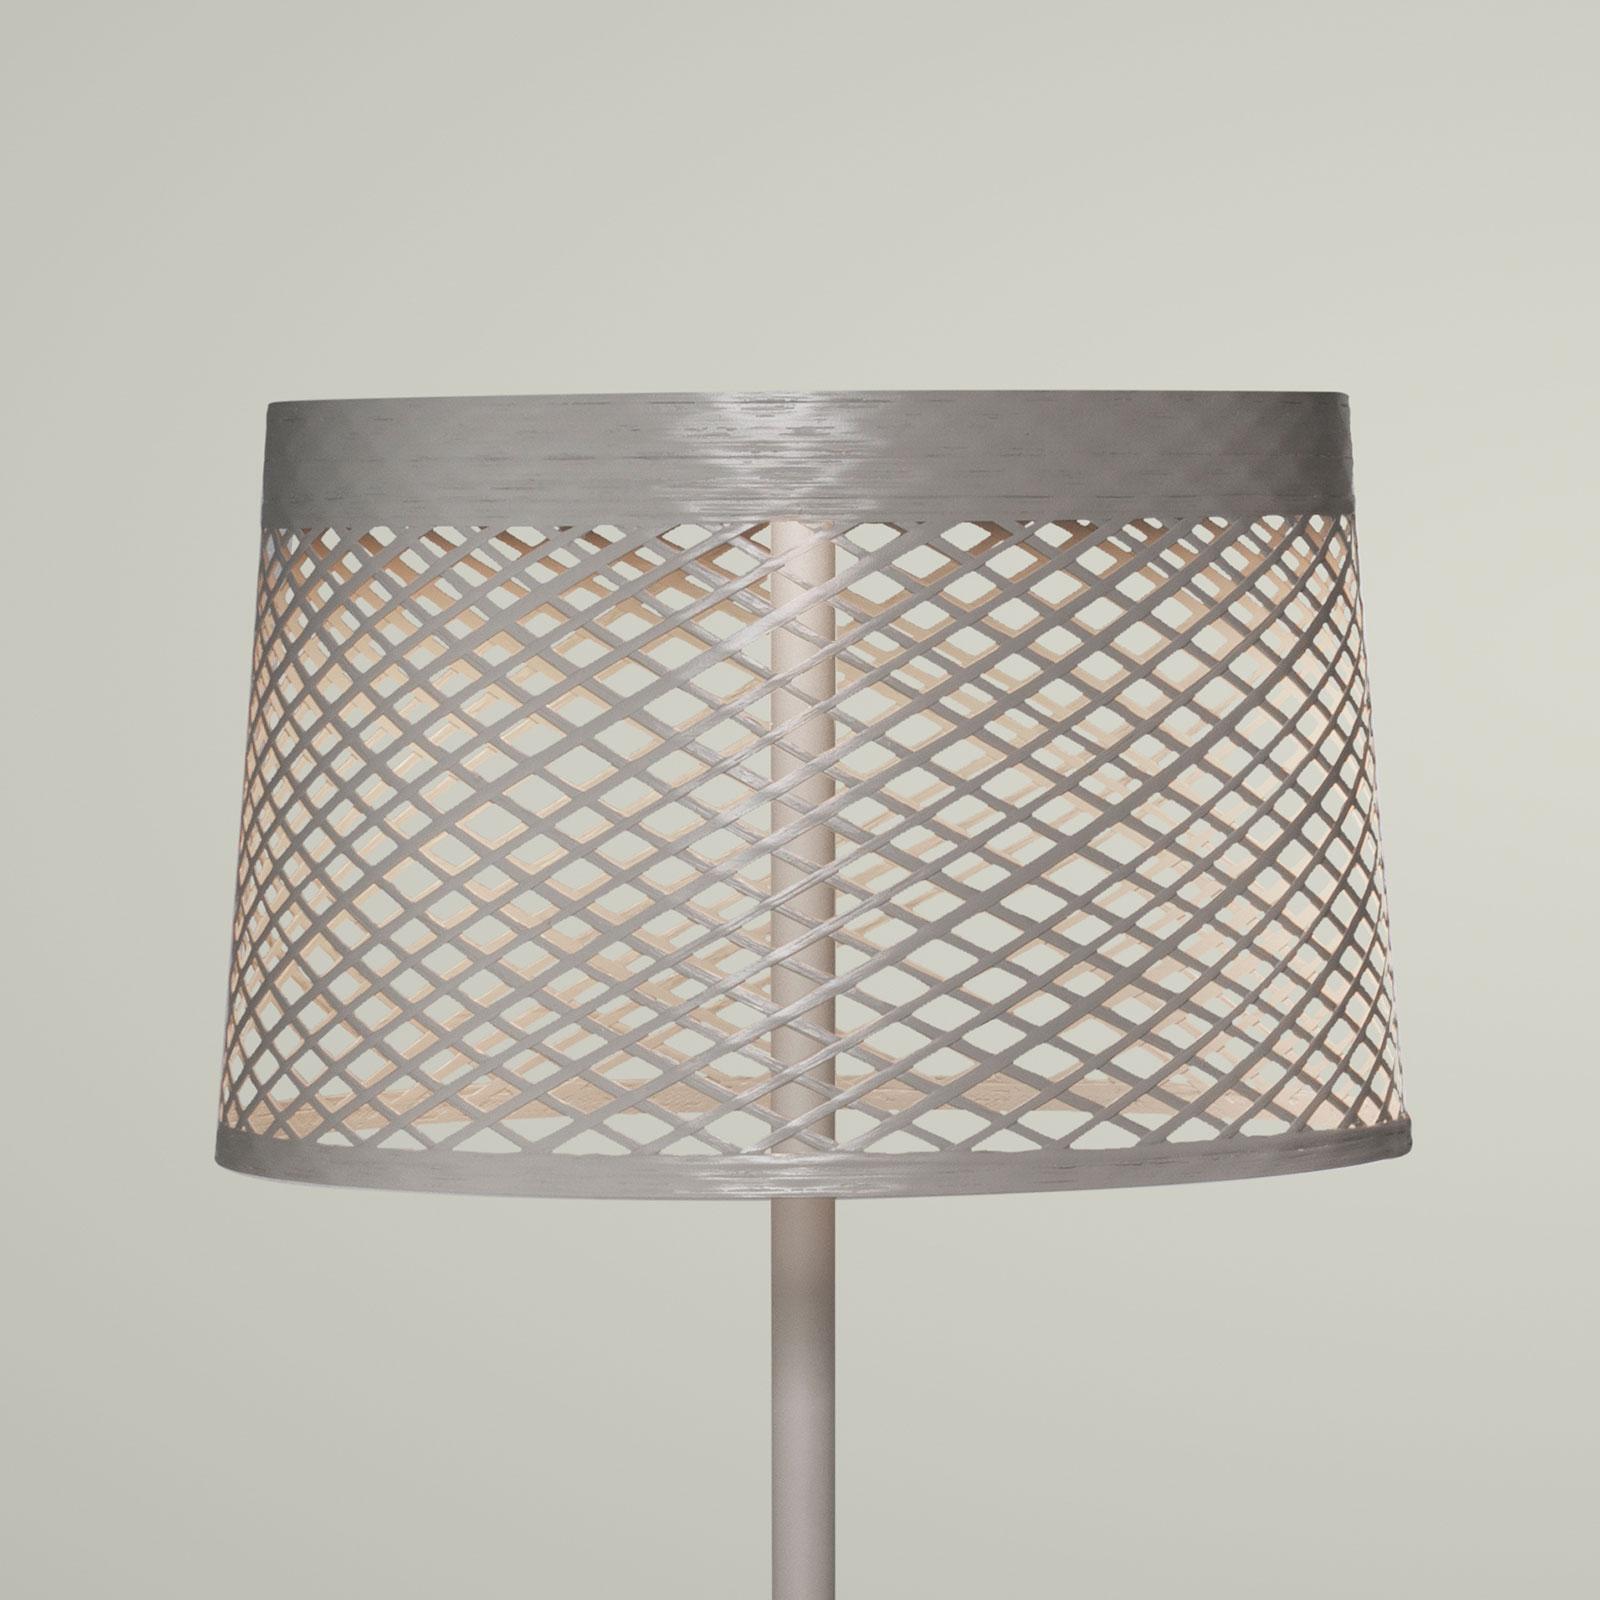 Foscarini Twiggy Grid lettura lampa stojąca greige